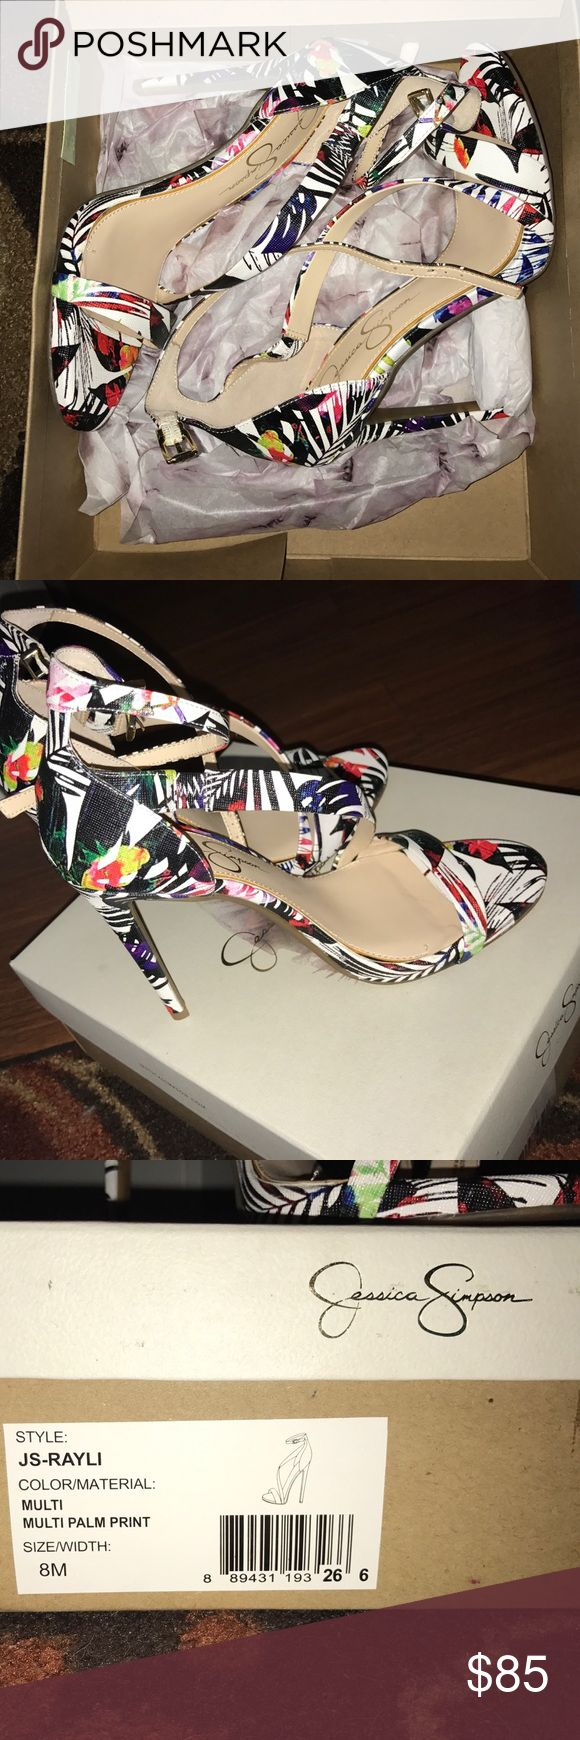 Jessica Simpson Multicolor Sandal Heel Jessica Simpson multicolored Sandal Heel. Brand new with box. Size 8. Jessica Simpson Shoes Heels